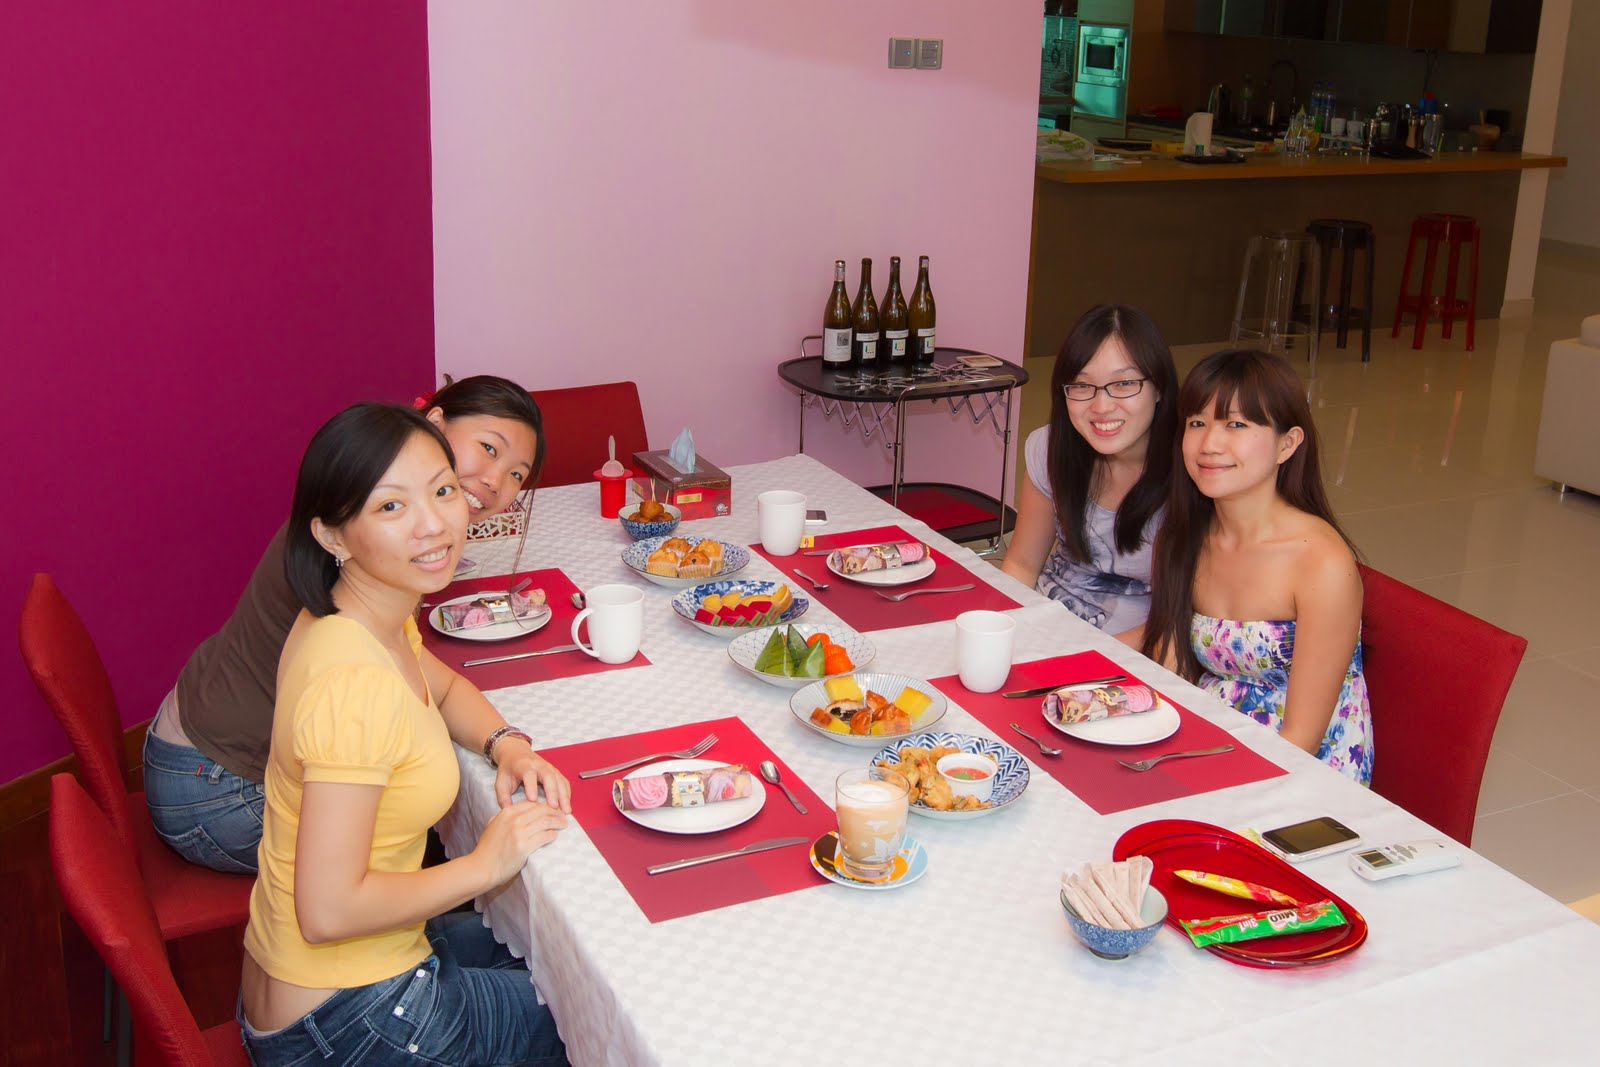 http://1.bp.blogspot.com/-bZ3je4FzdfI/ThmugYXhMrI/AAAAAAAAeh4/98AyQwlpCaQ/s1600/afternoon+tea-3.jpg